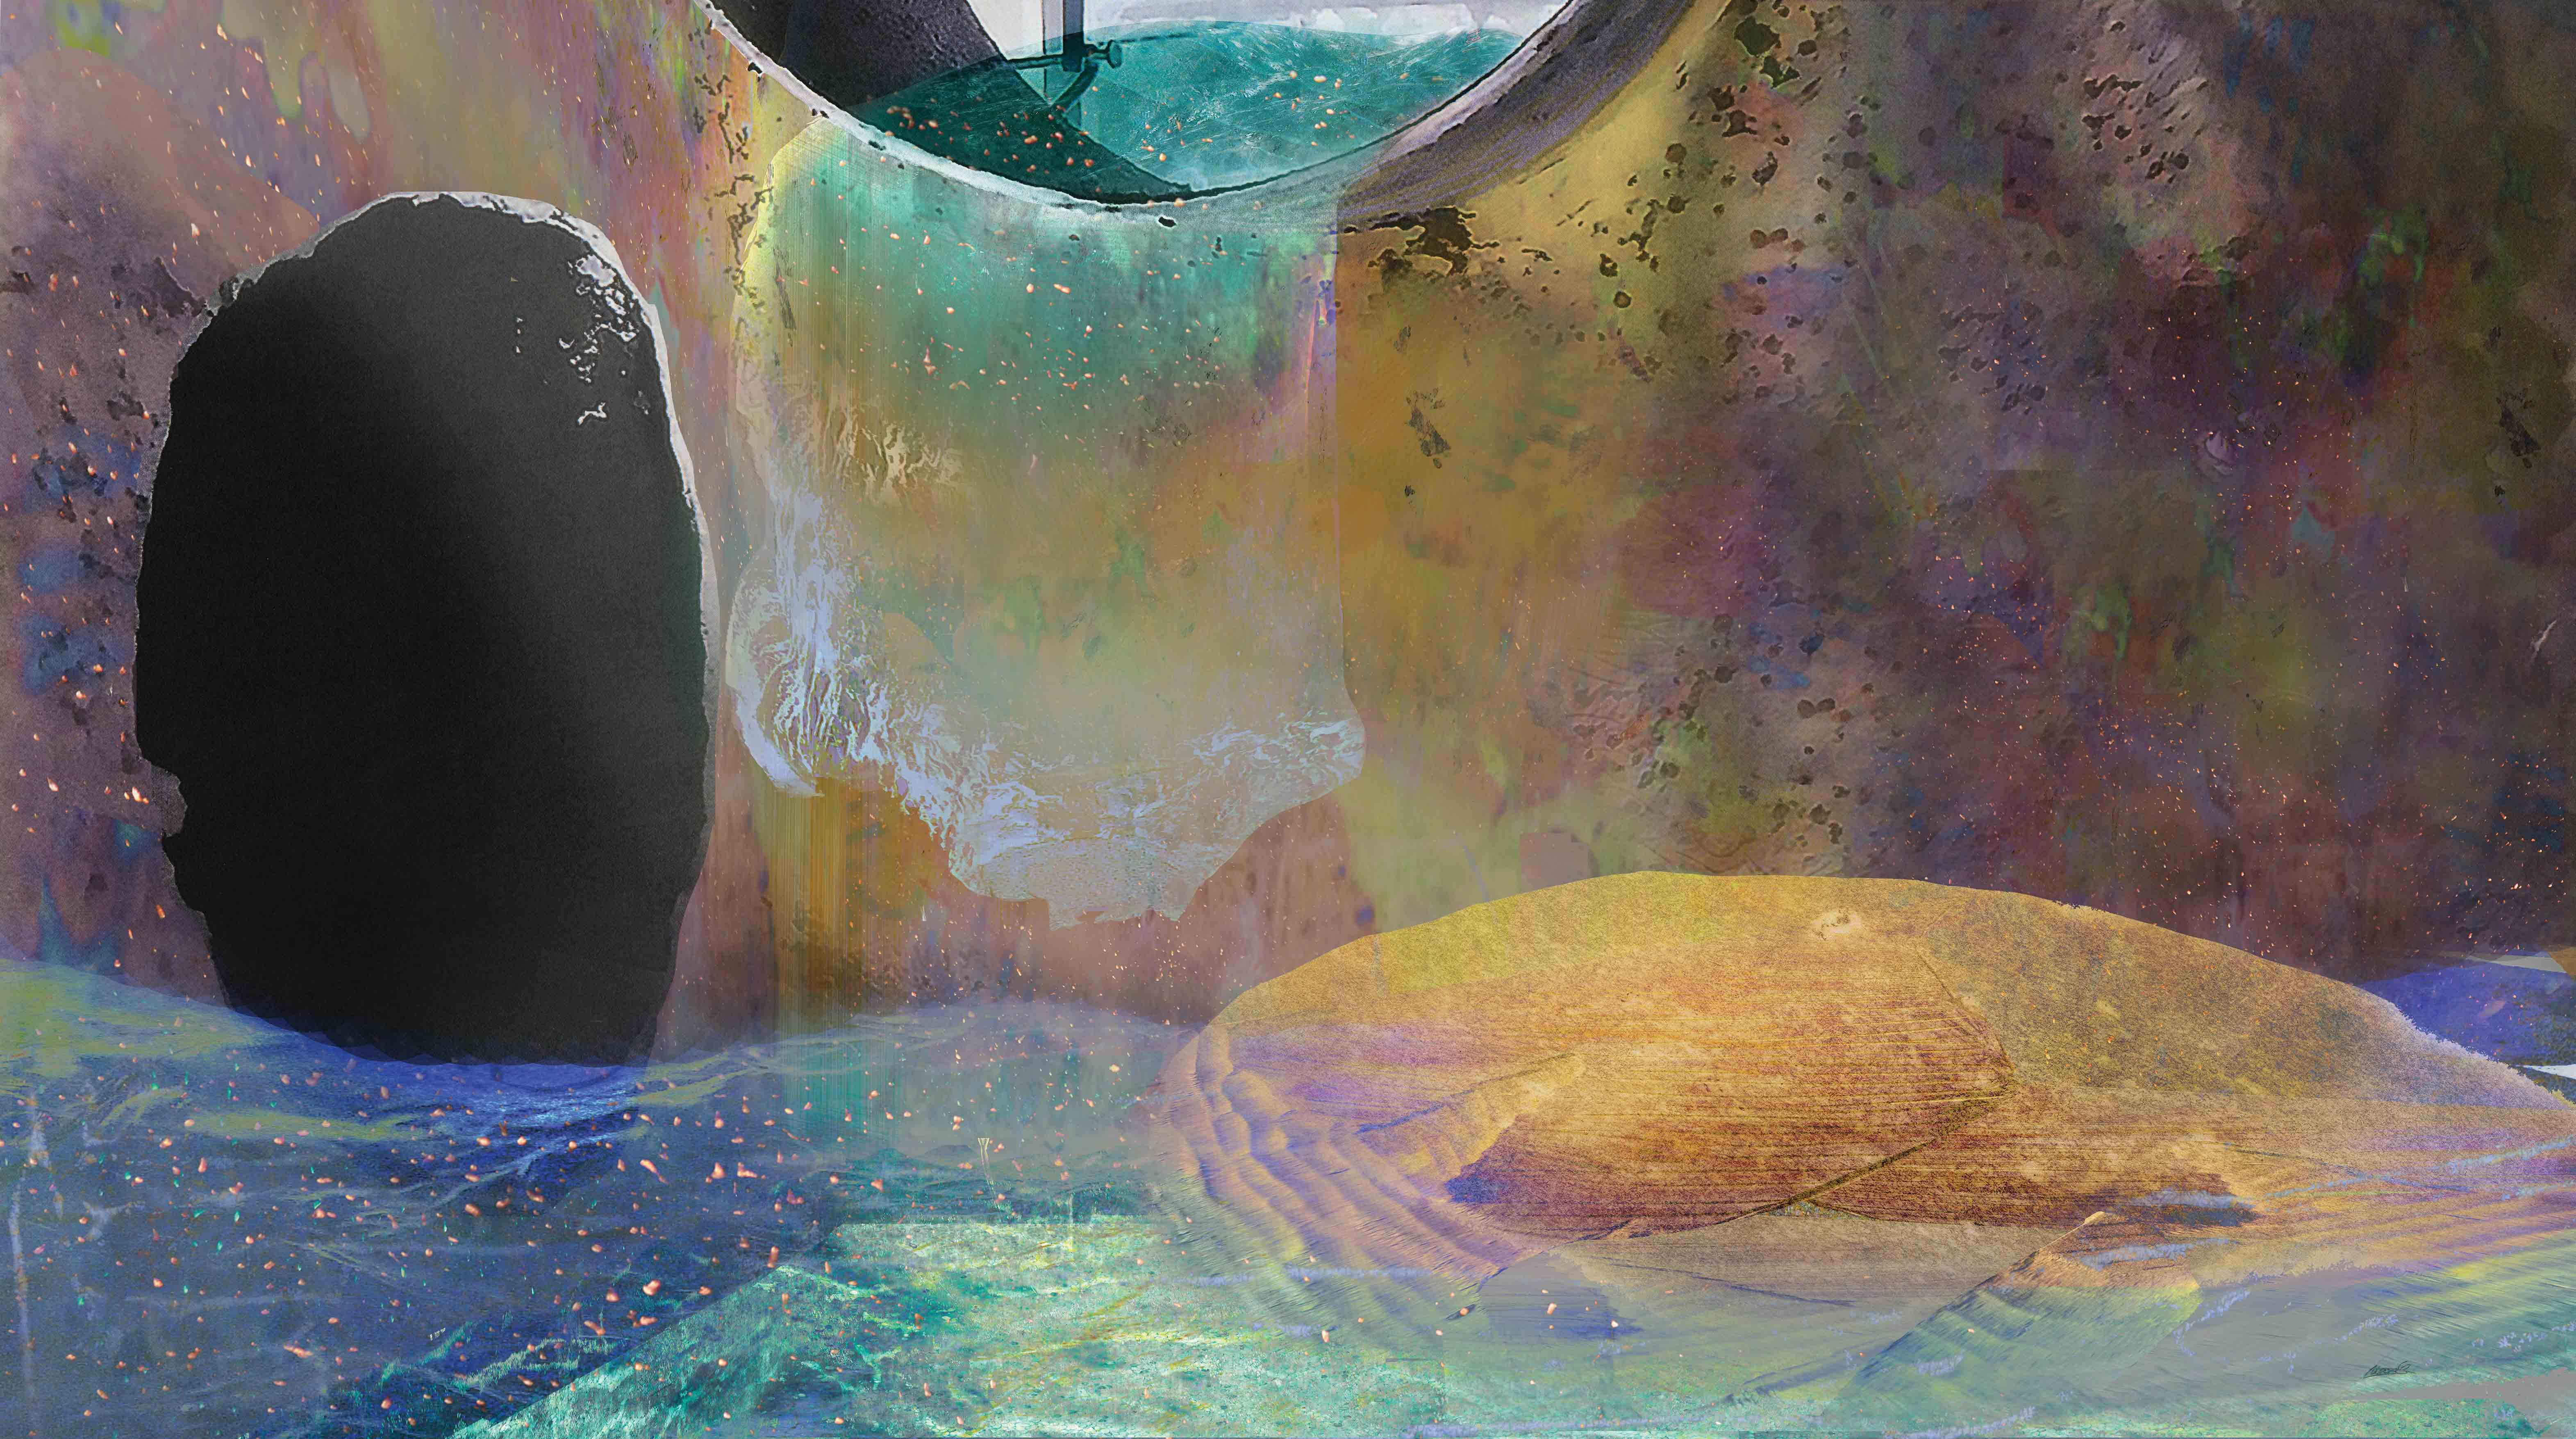 Alluring-Sewers-by-Lana-Charara-(CMYK-400dpi)